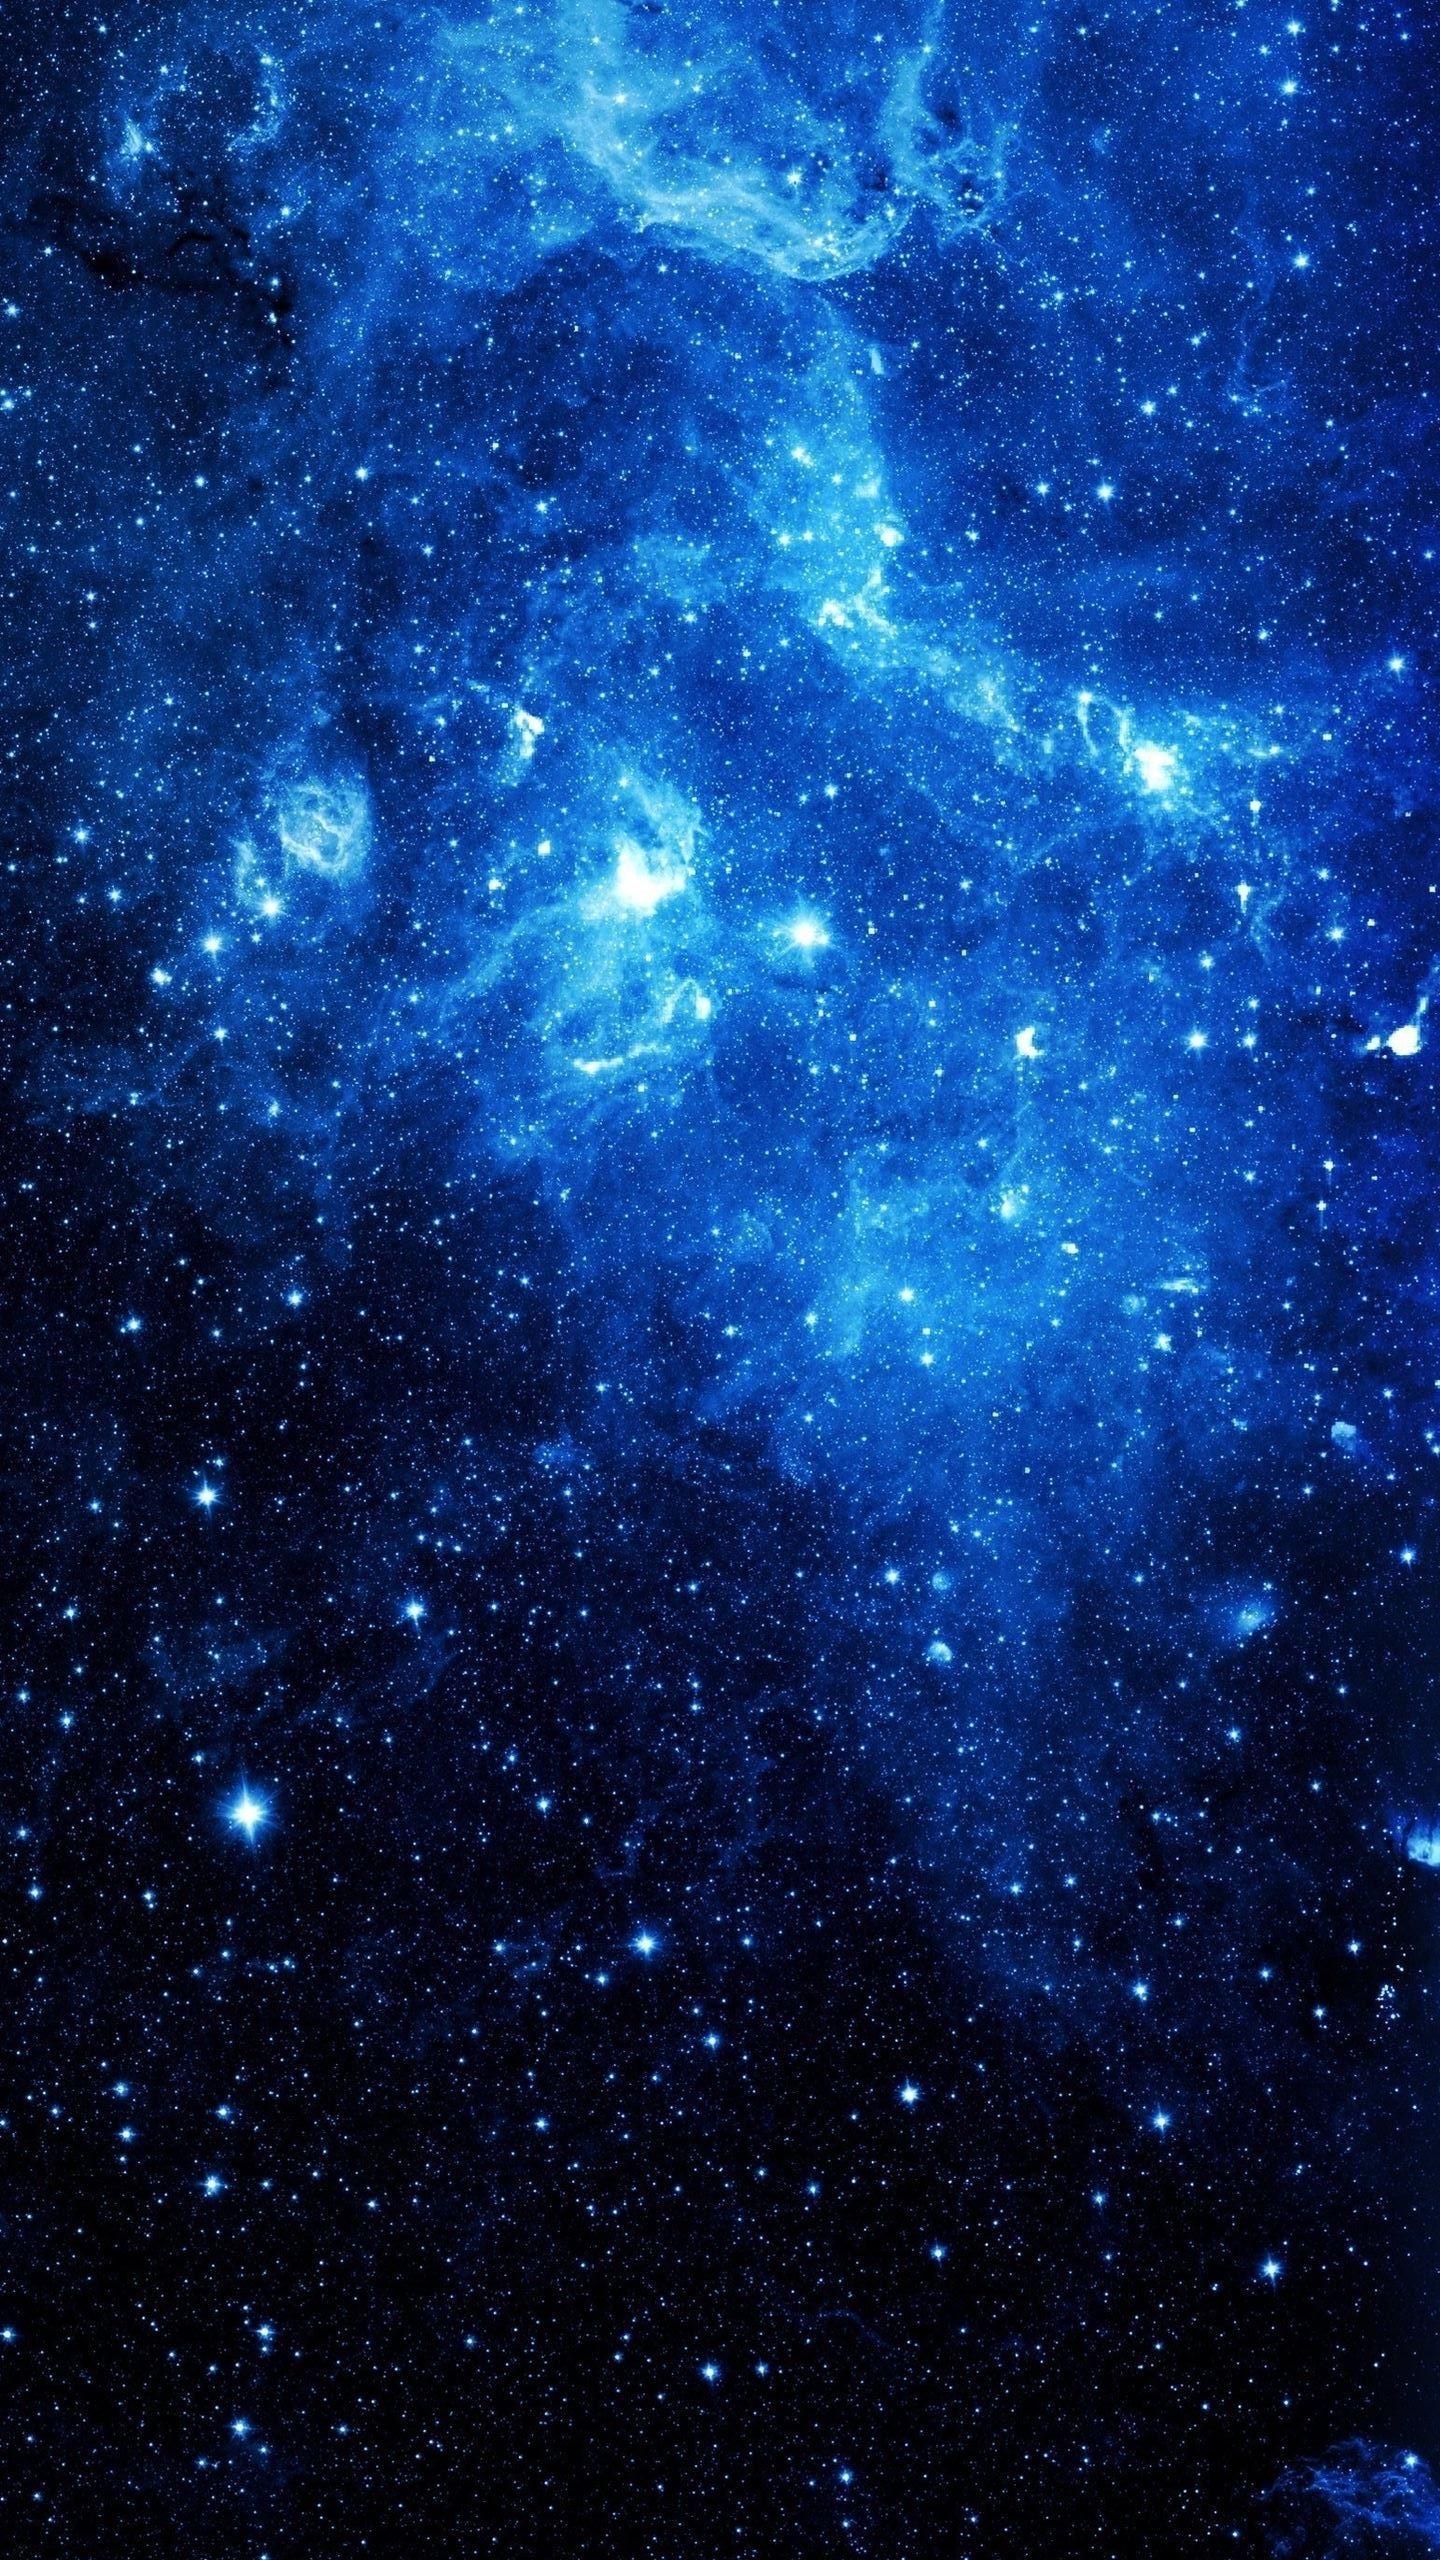 Skybackground Check More At Http Www Resim3 Garipbilgiler Com 2020 01 08 2856 In 2020 Blue Sky Wallpaper Blue Wallpaper Iphone Galaxy Art